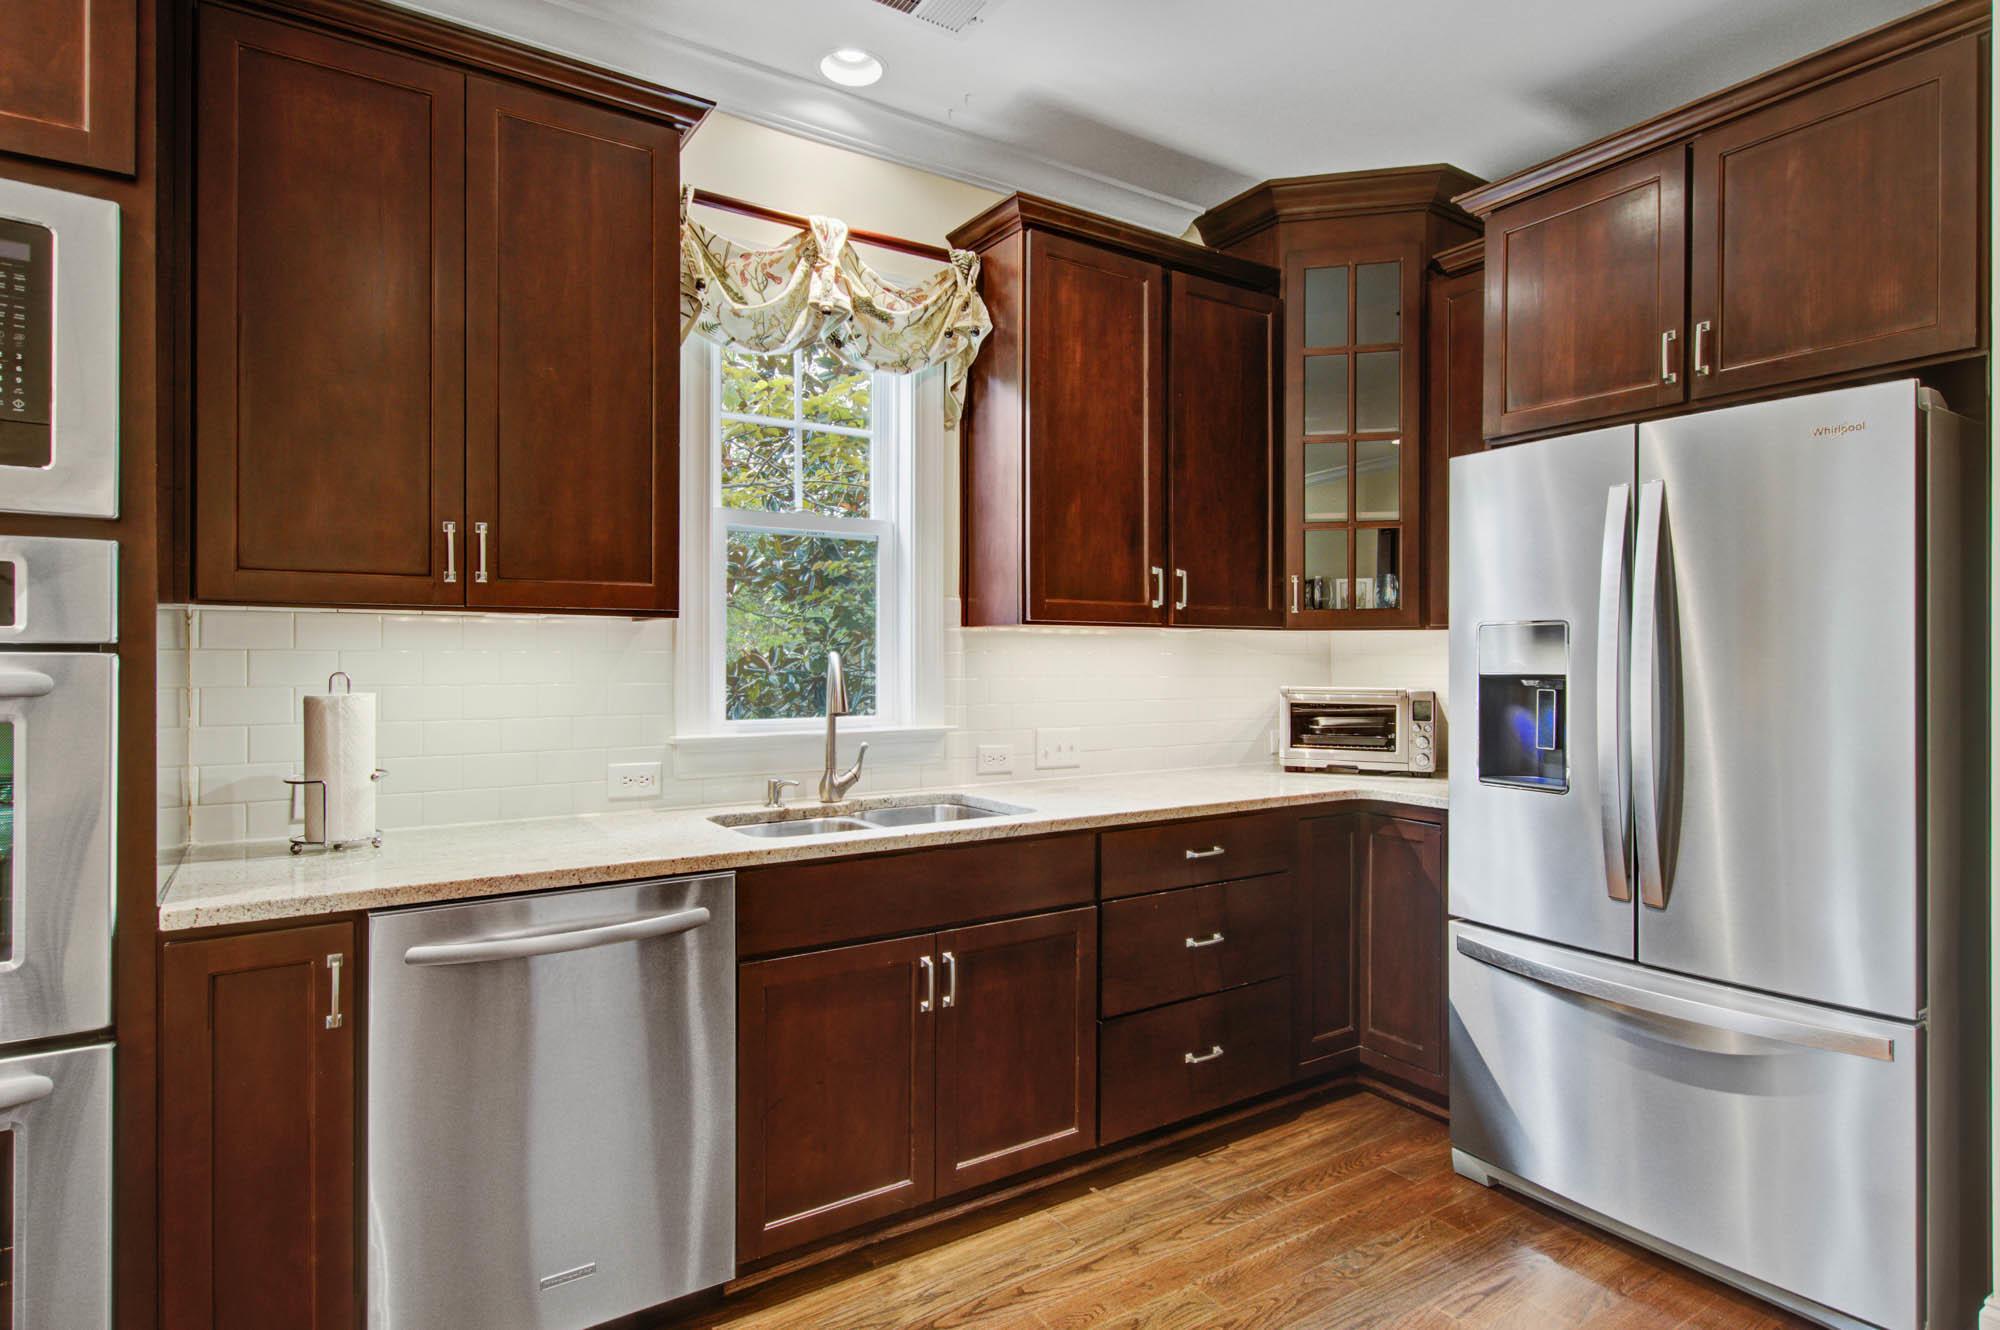 Hamlin Plantation Homes For Sale - 2840 Treadwell, Mount Pleasant, SC - 14